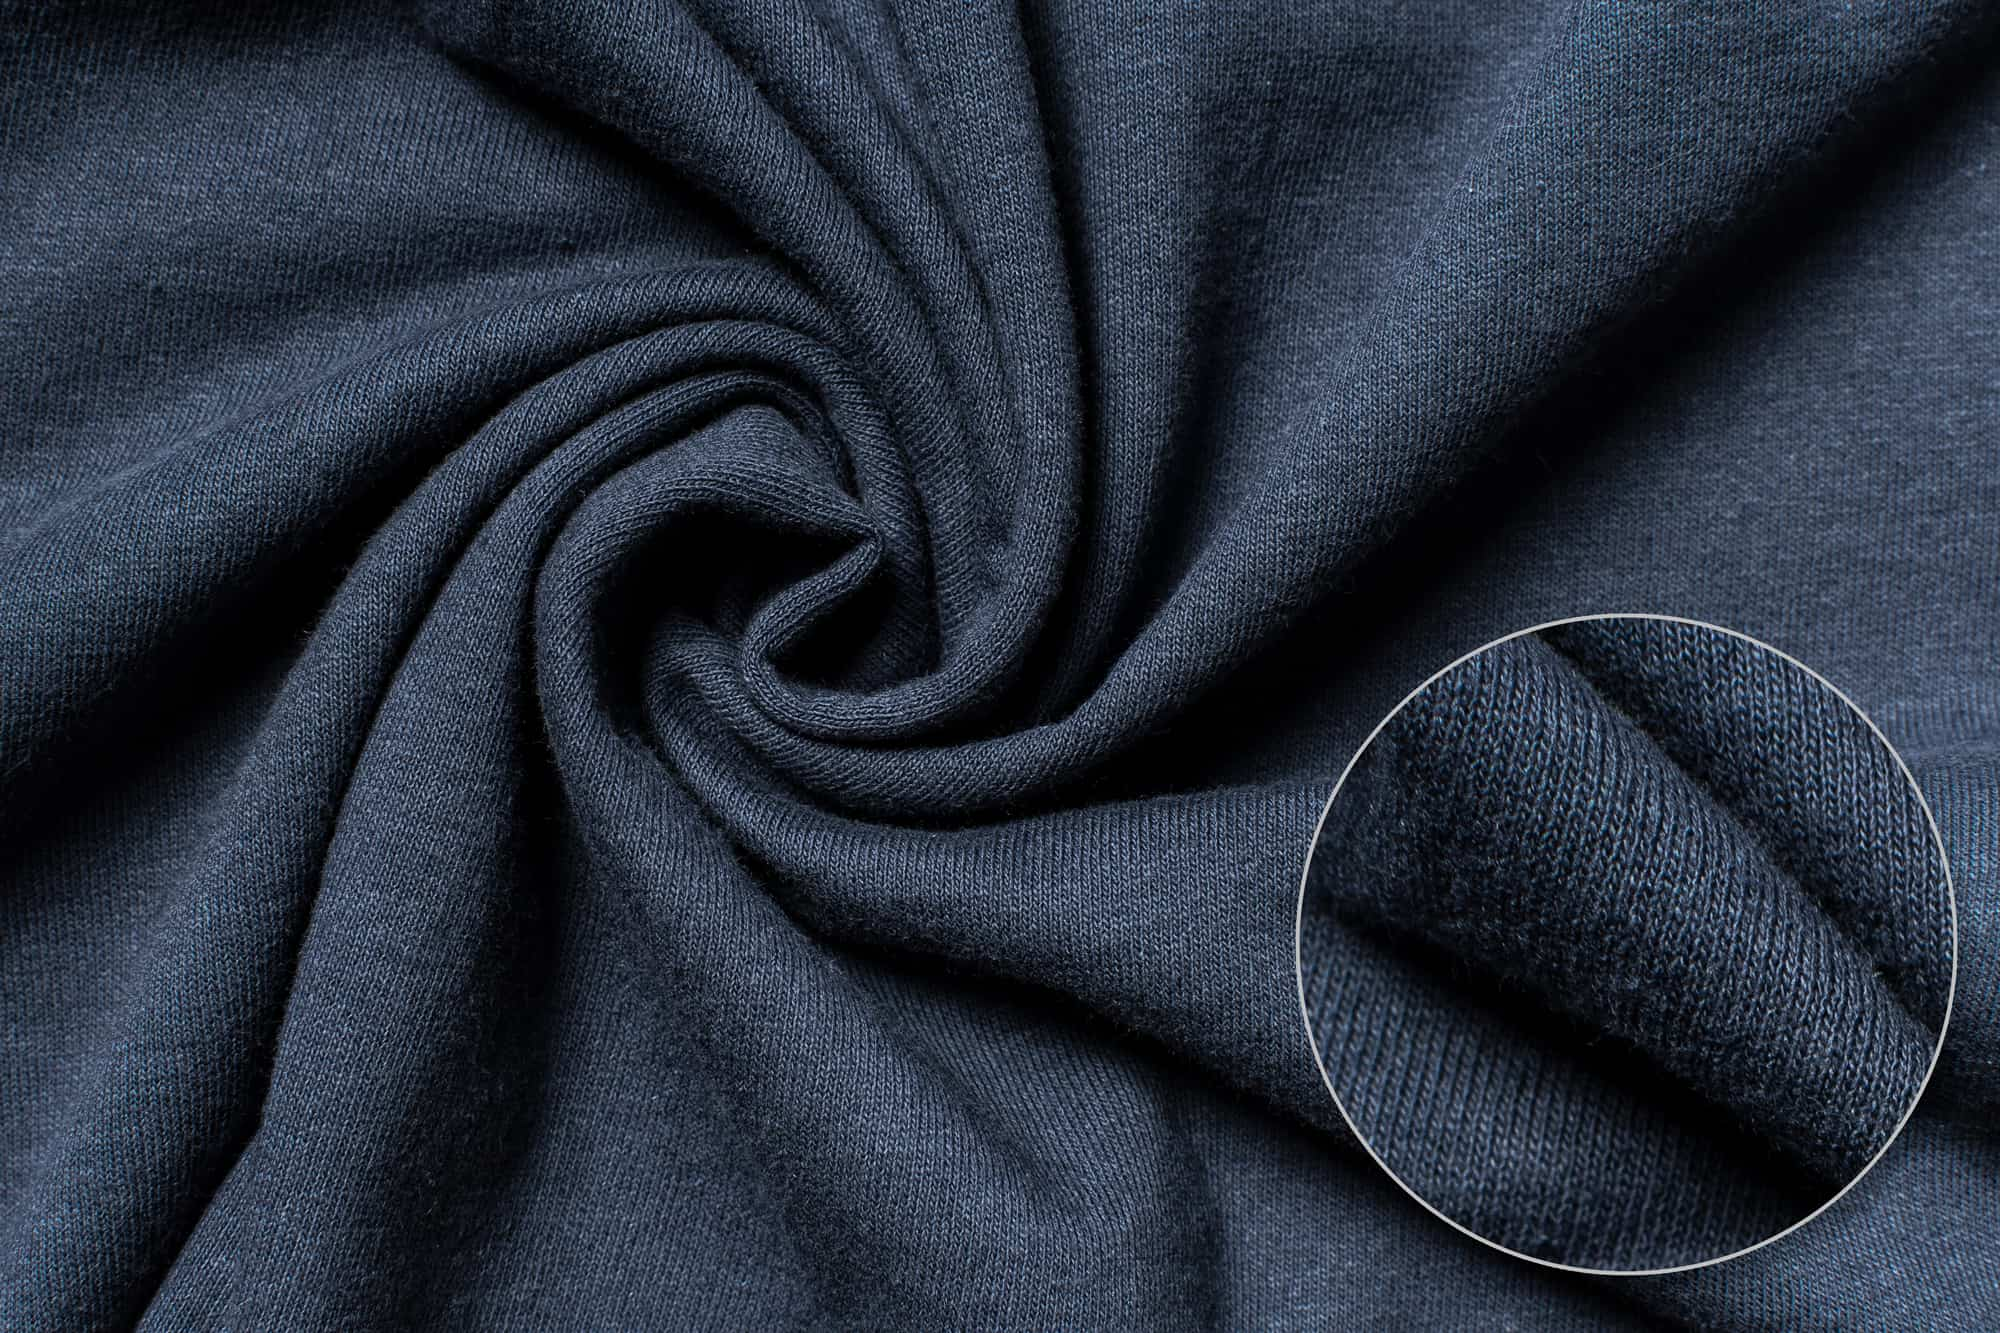 Fabric detail of the Gildan Ultra Cotton Tee.